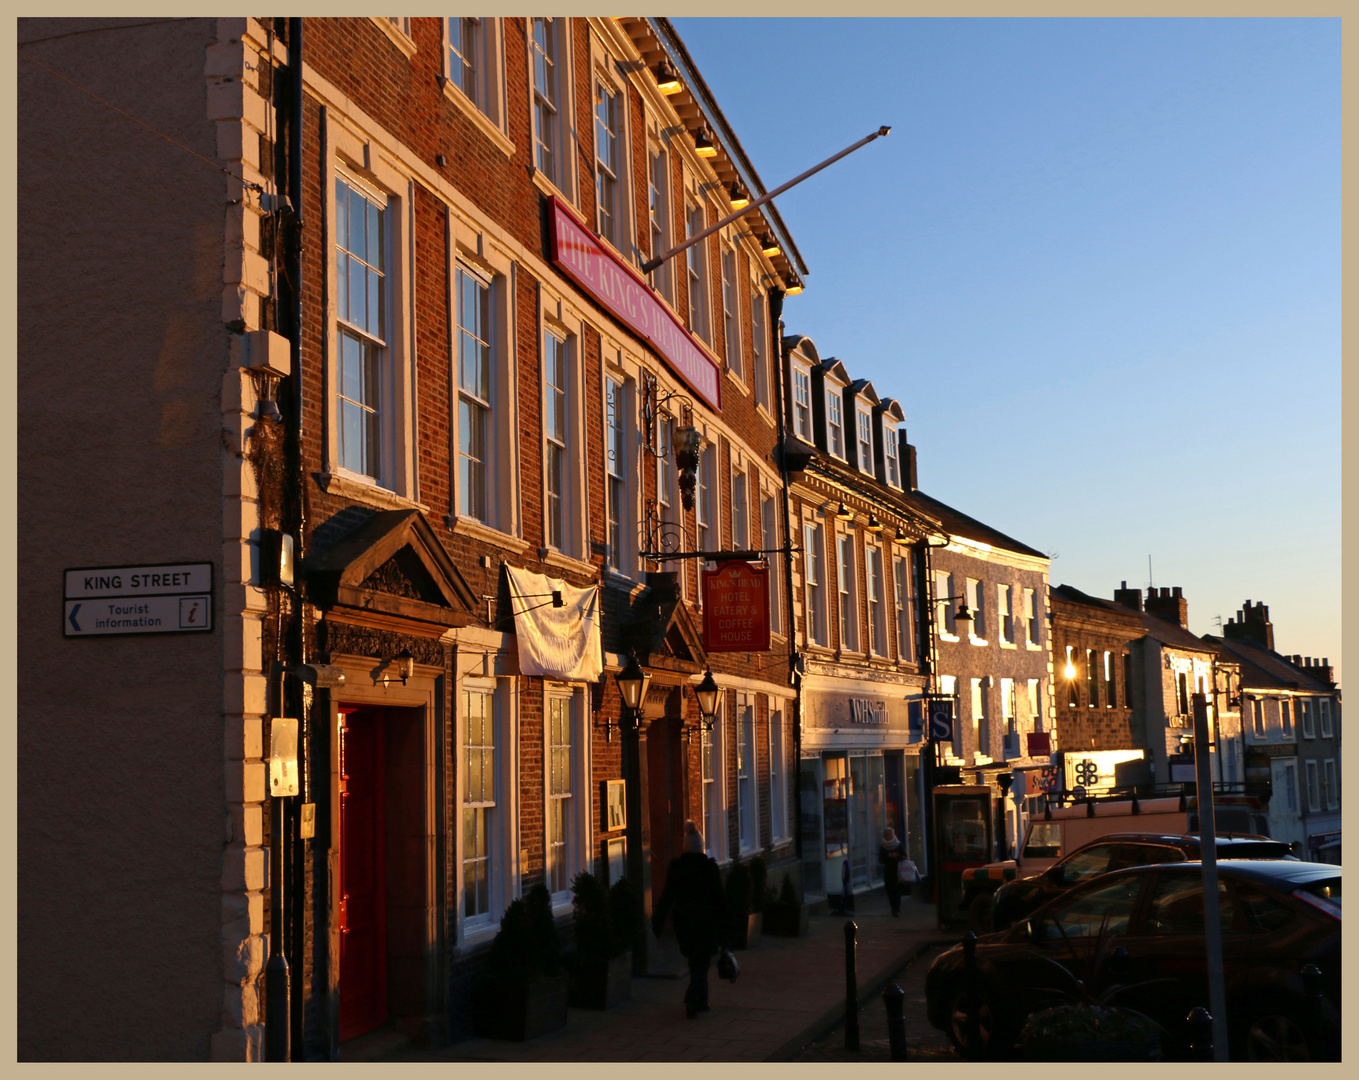 Richmond marketplace early morning